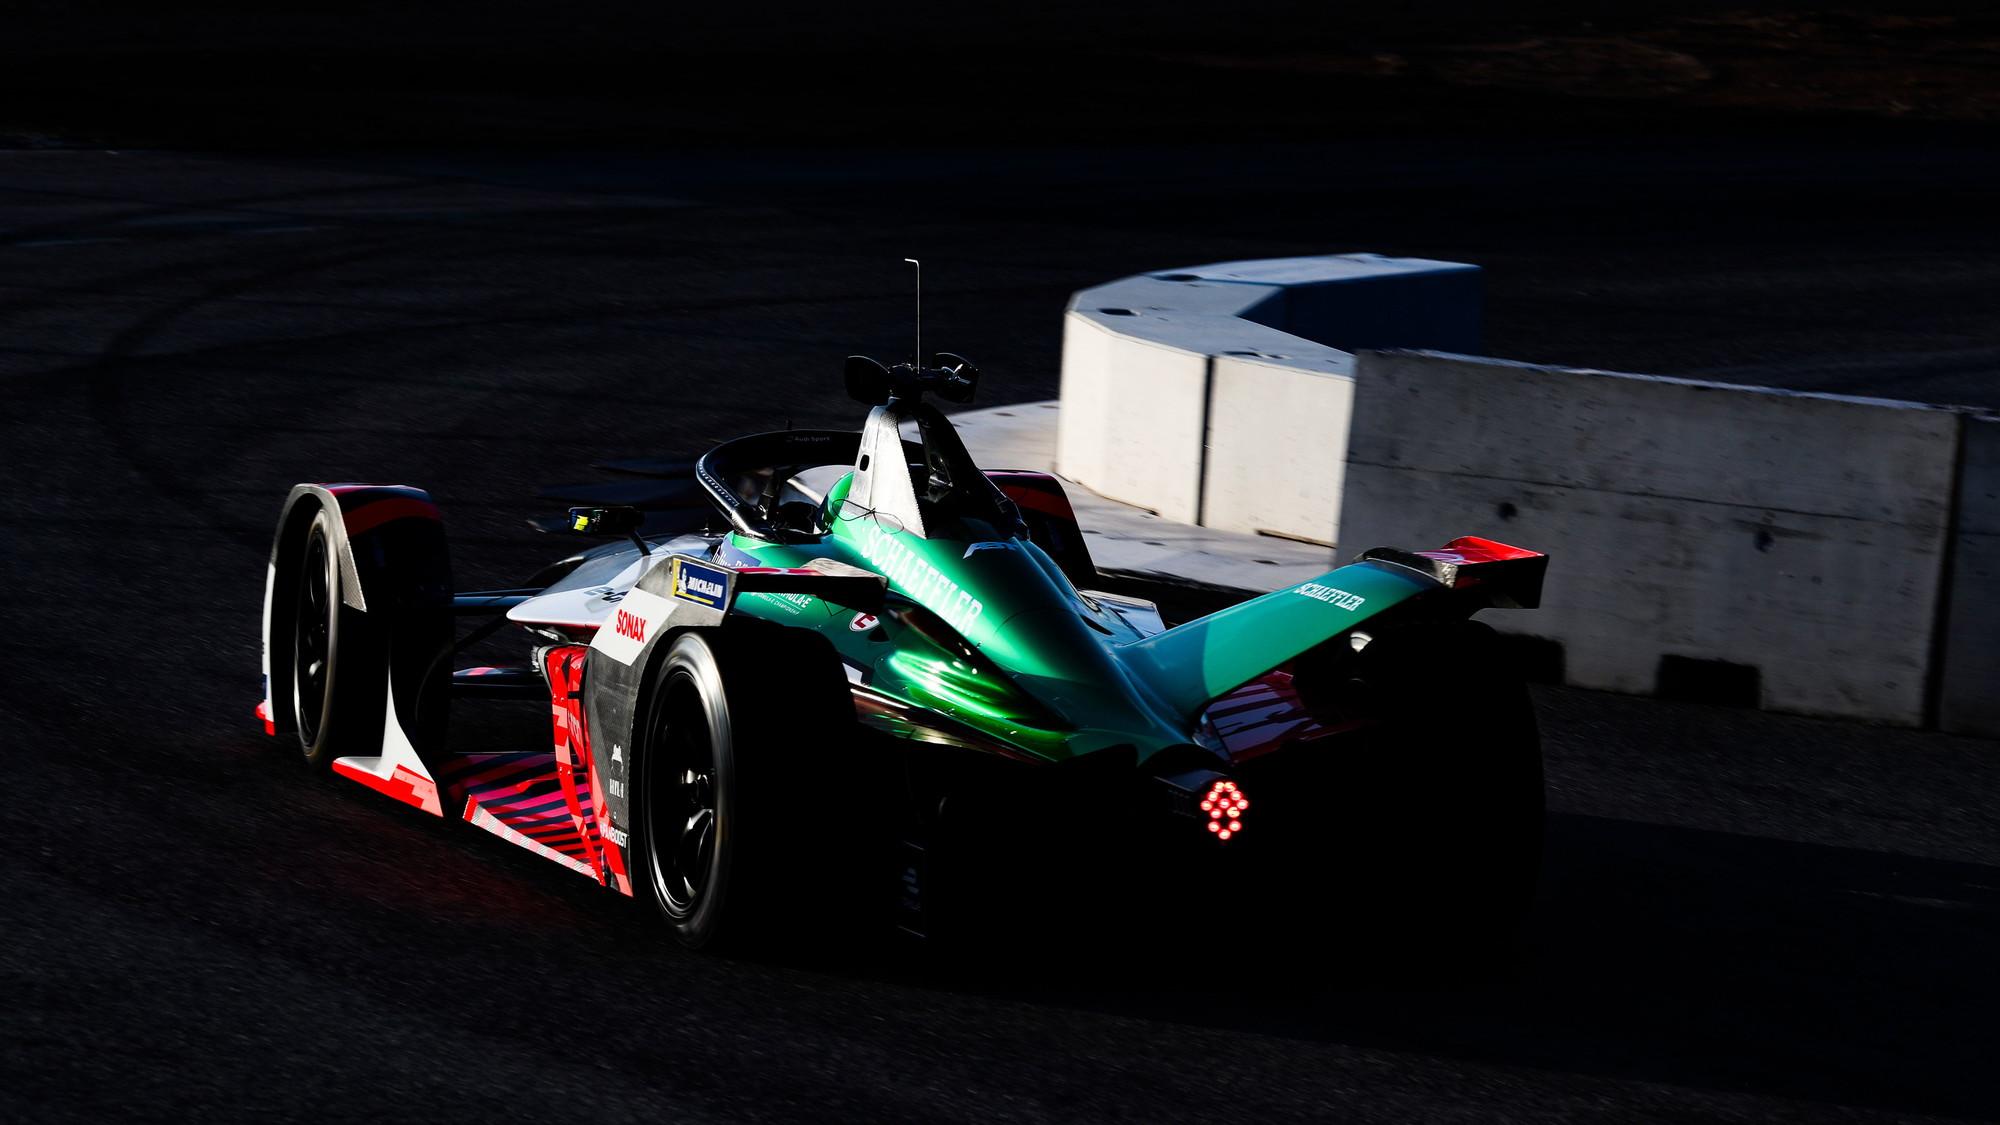 Audi FE06 Formula E race car